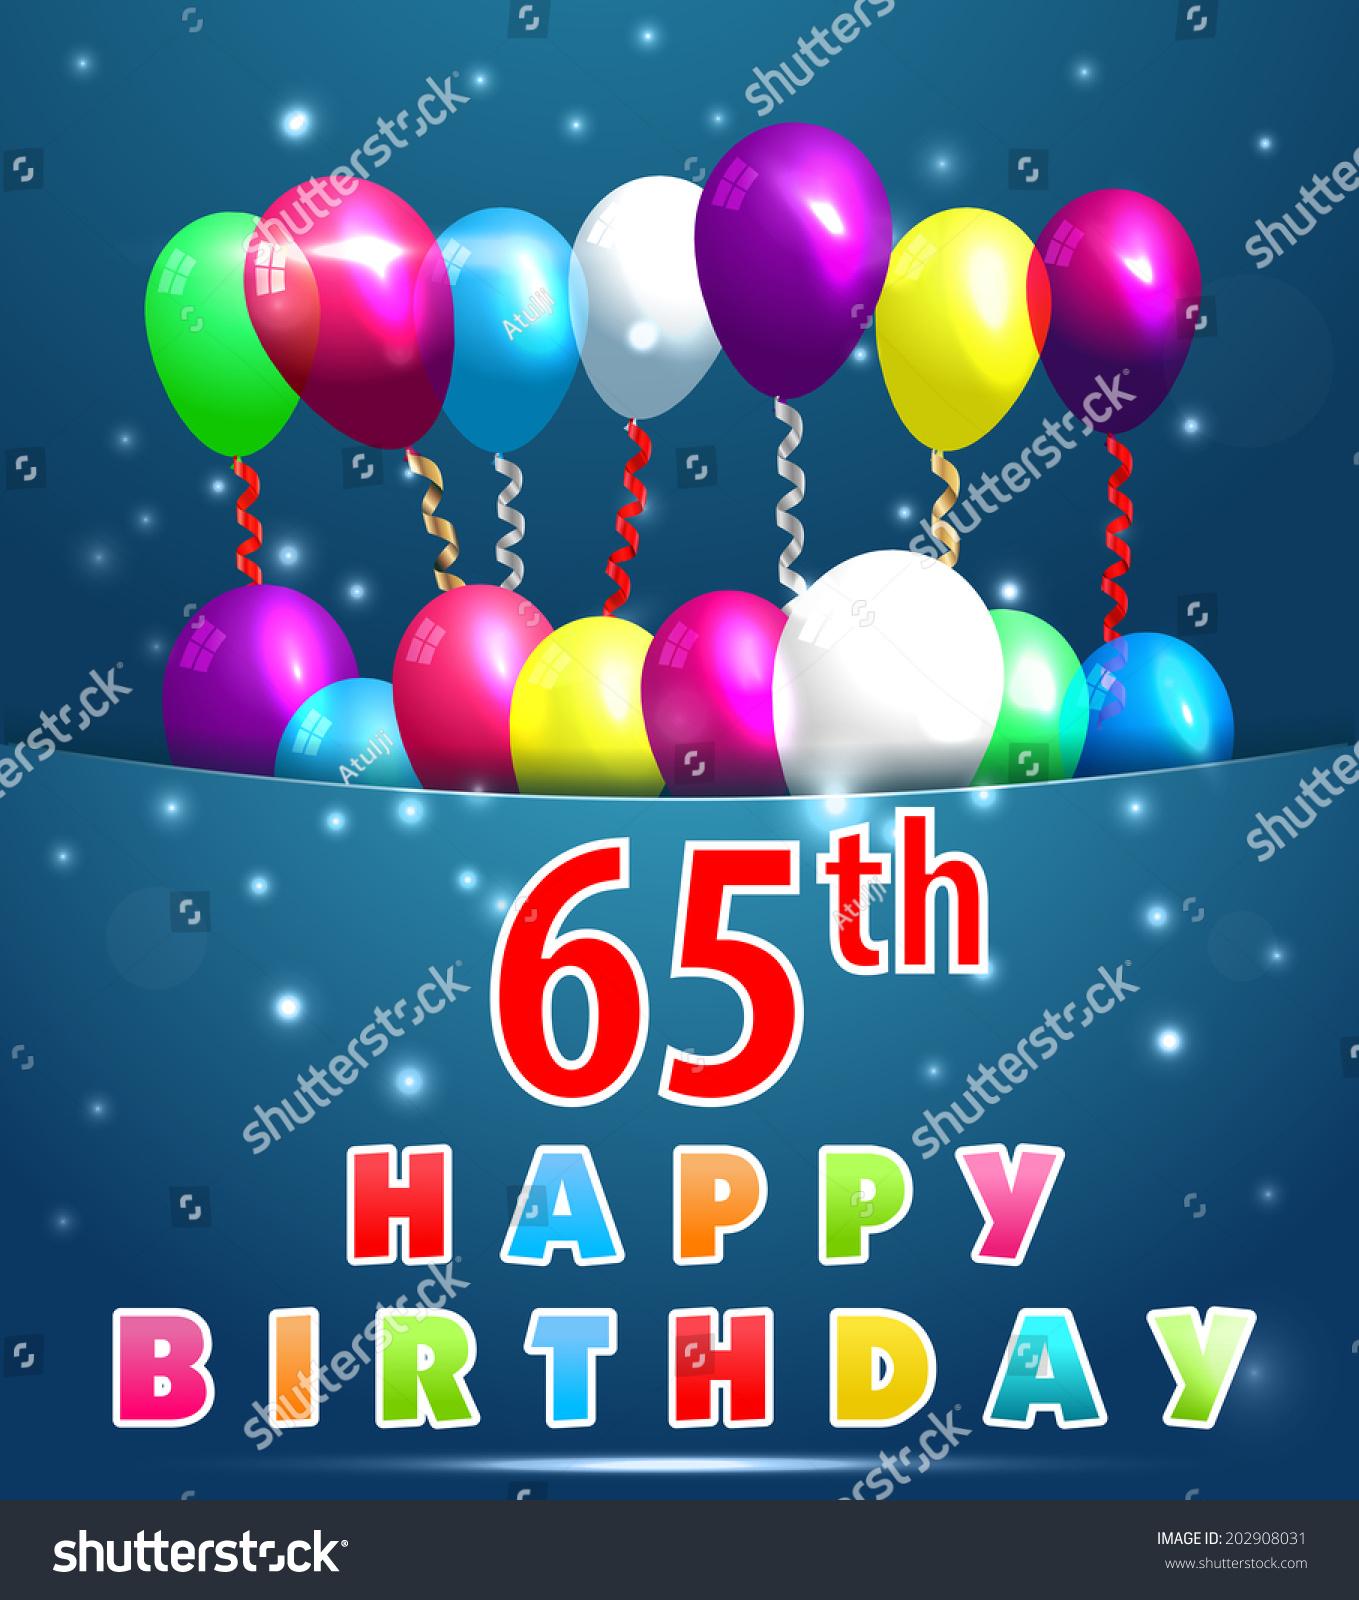 65 Year Happy Birthday Card Balloons Vector 202908031 – Mum 65th Birthday Card